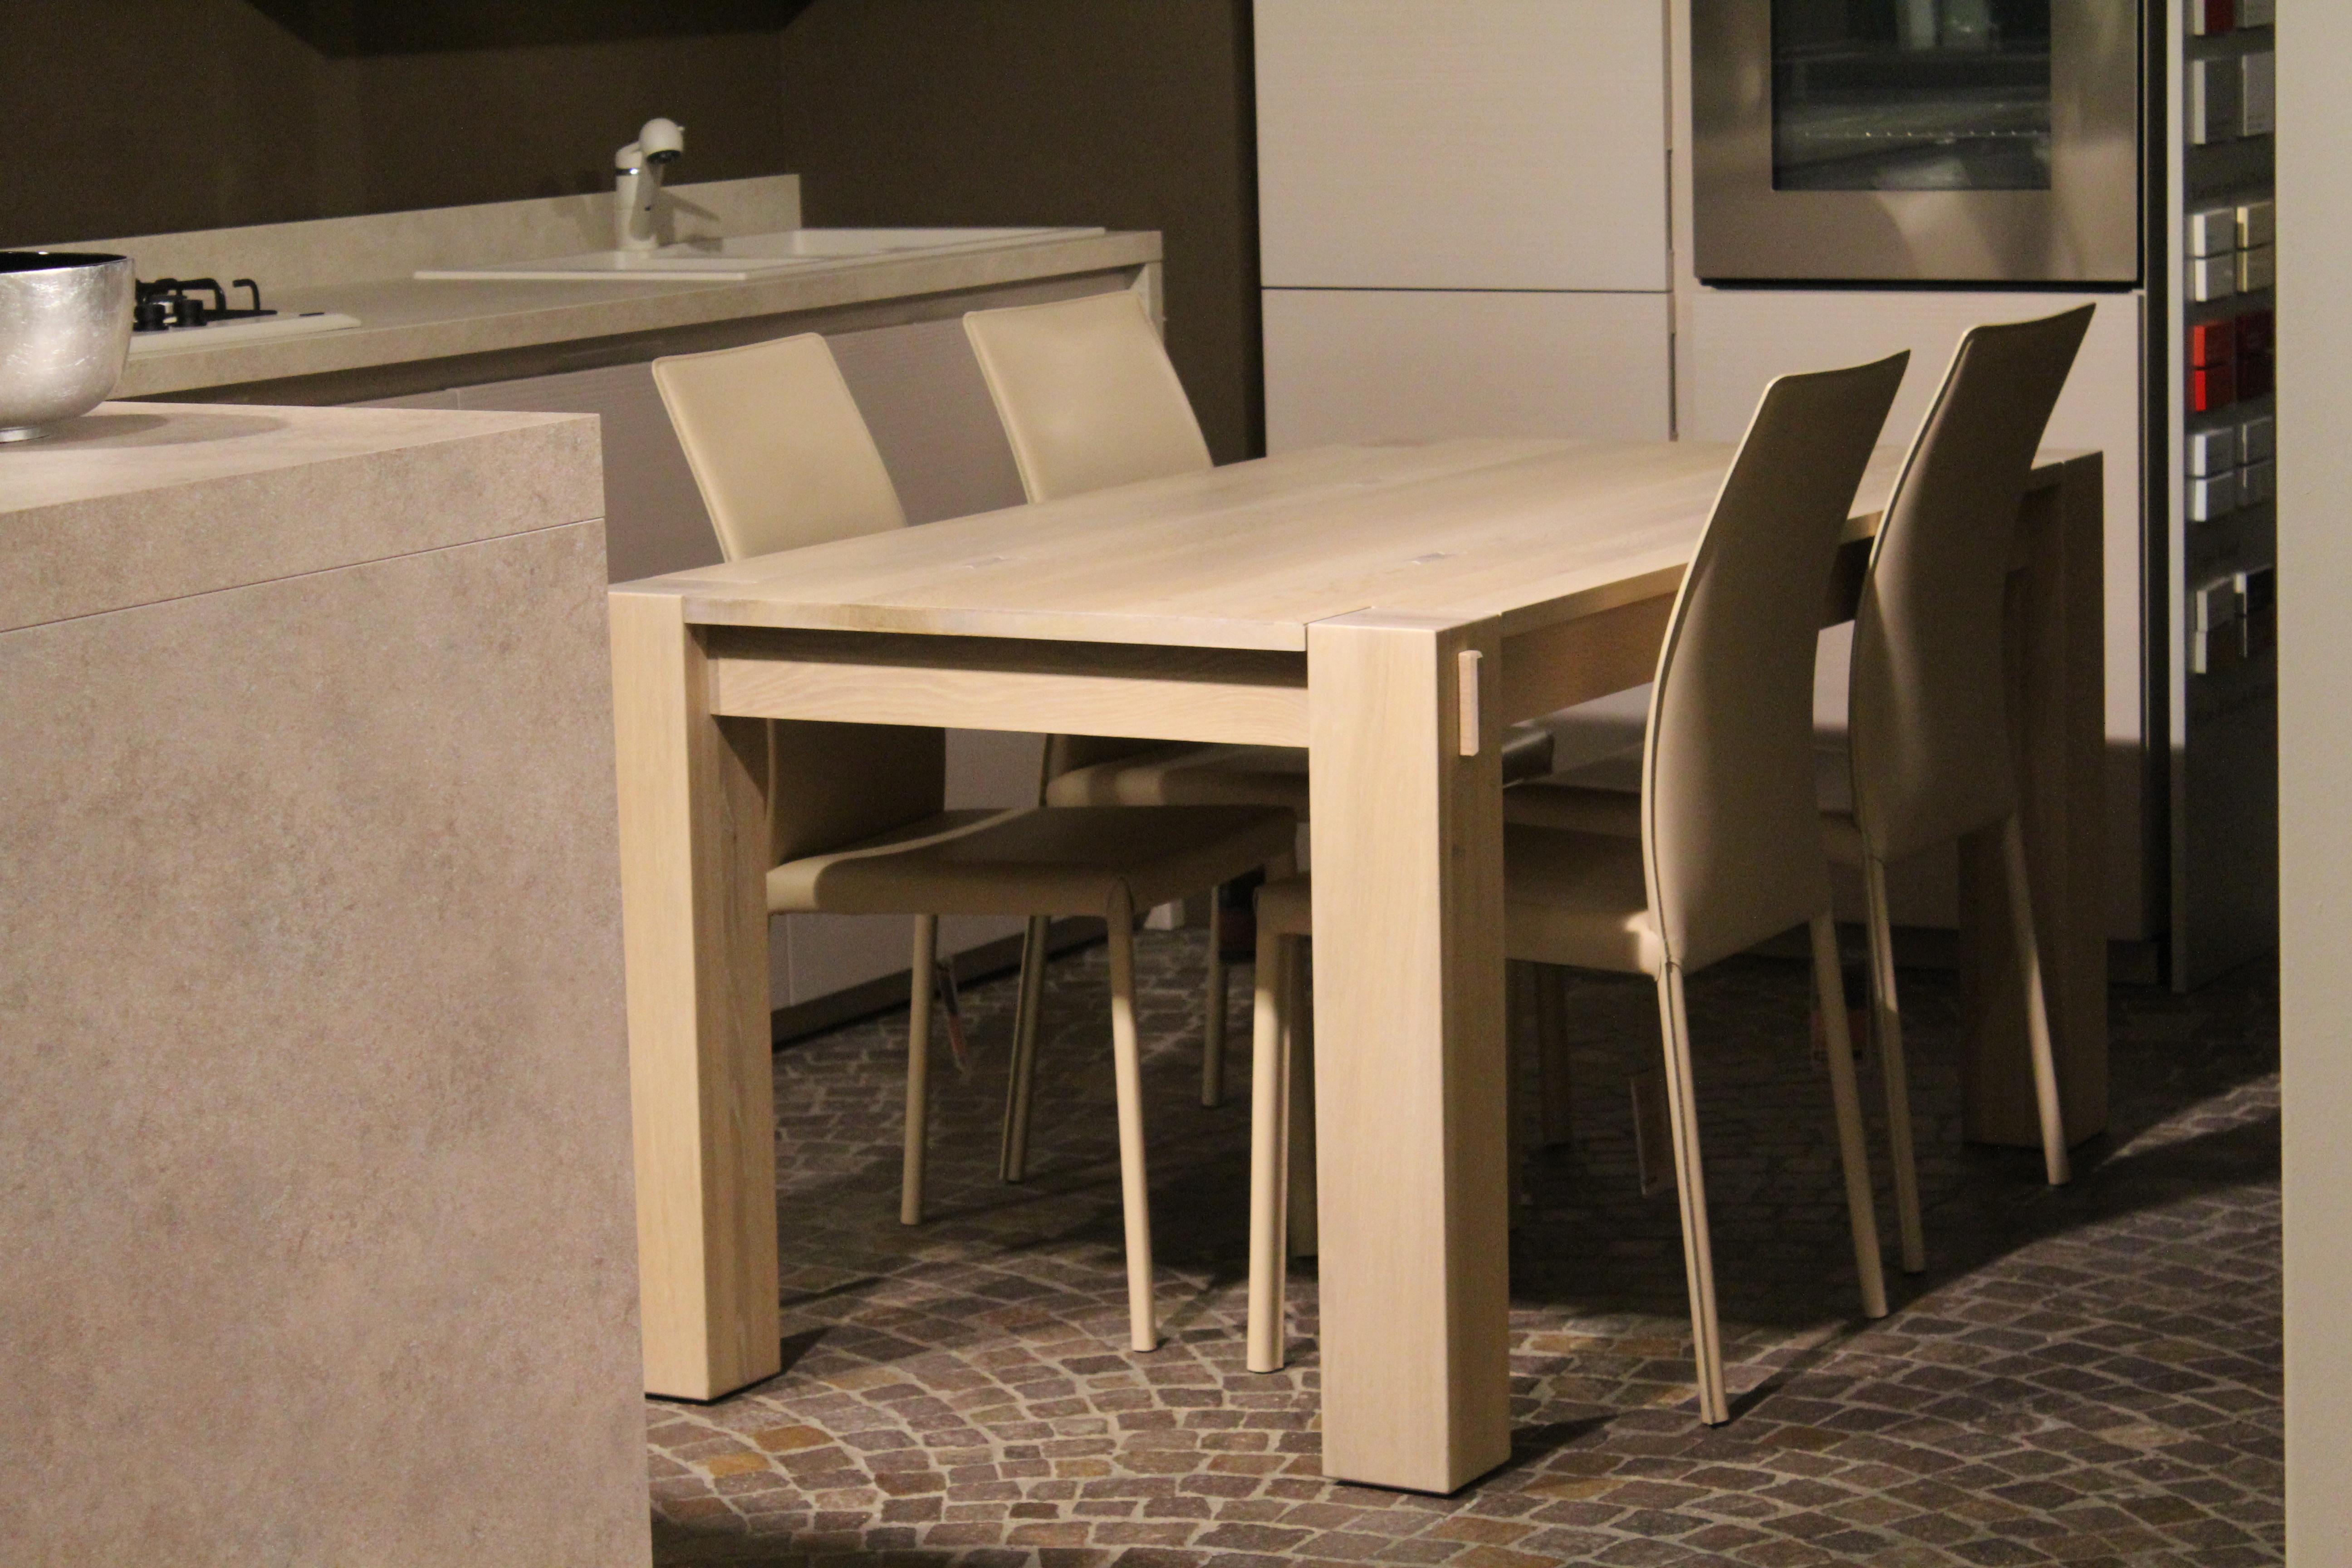 Fotos gratis escritorio mesa casa piso interior for Diseno de muebles de madera gratis